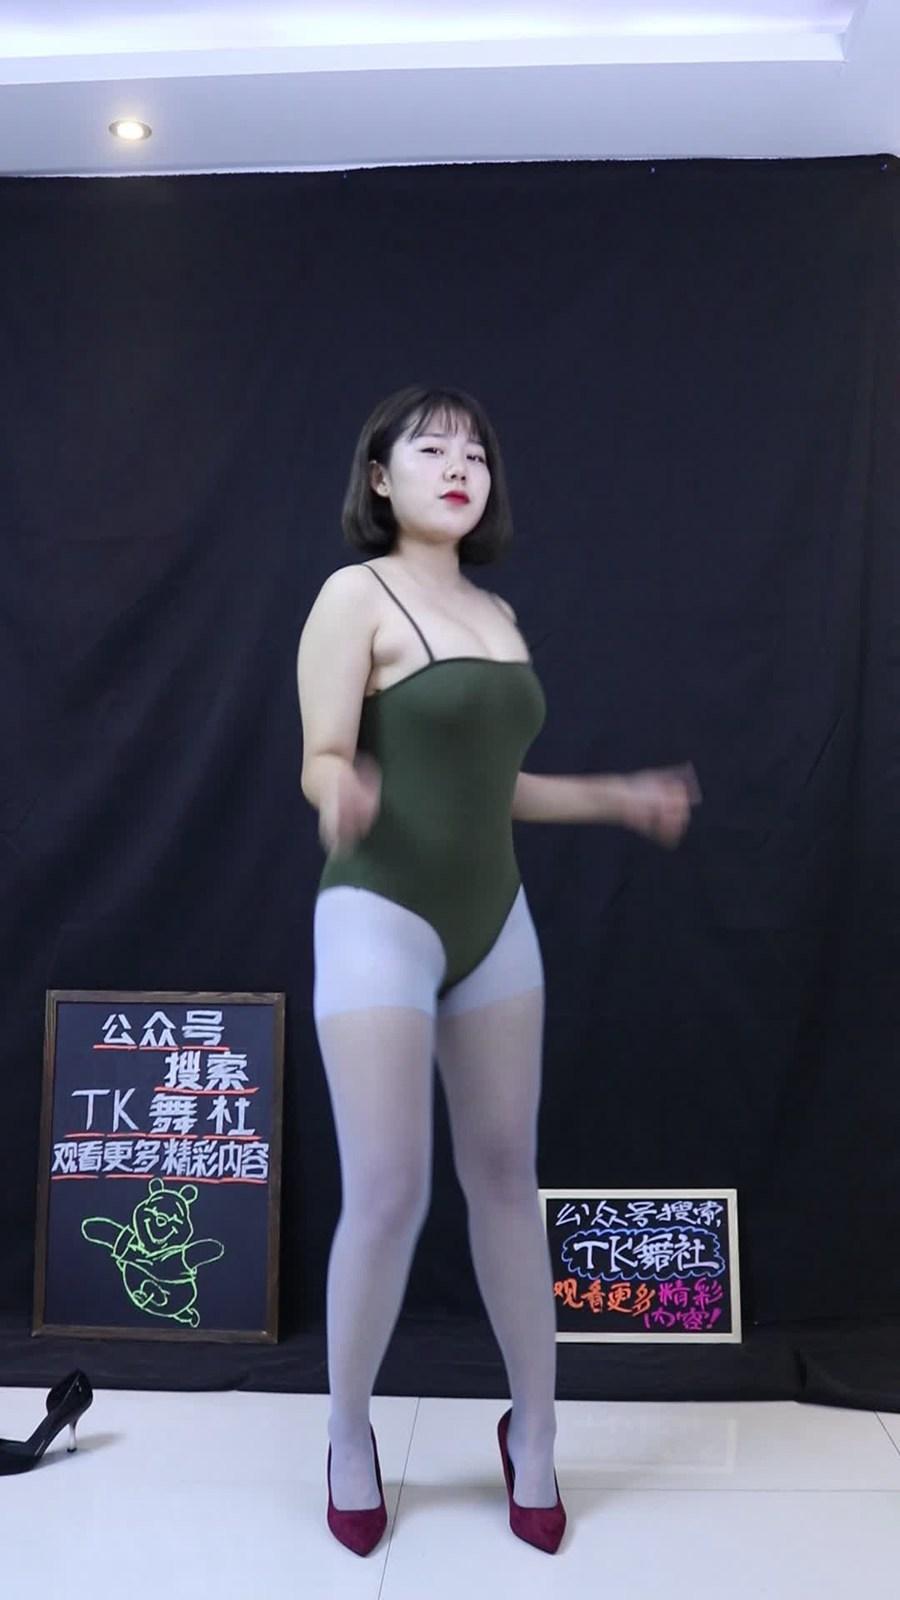 TK舞社 TK舞社 (84)